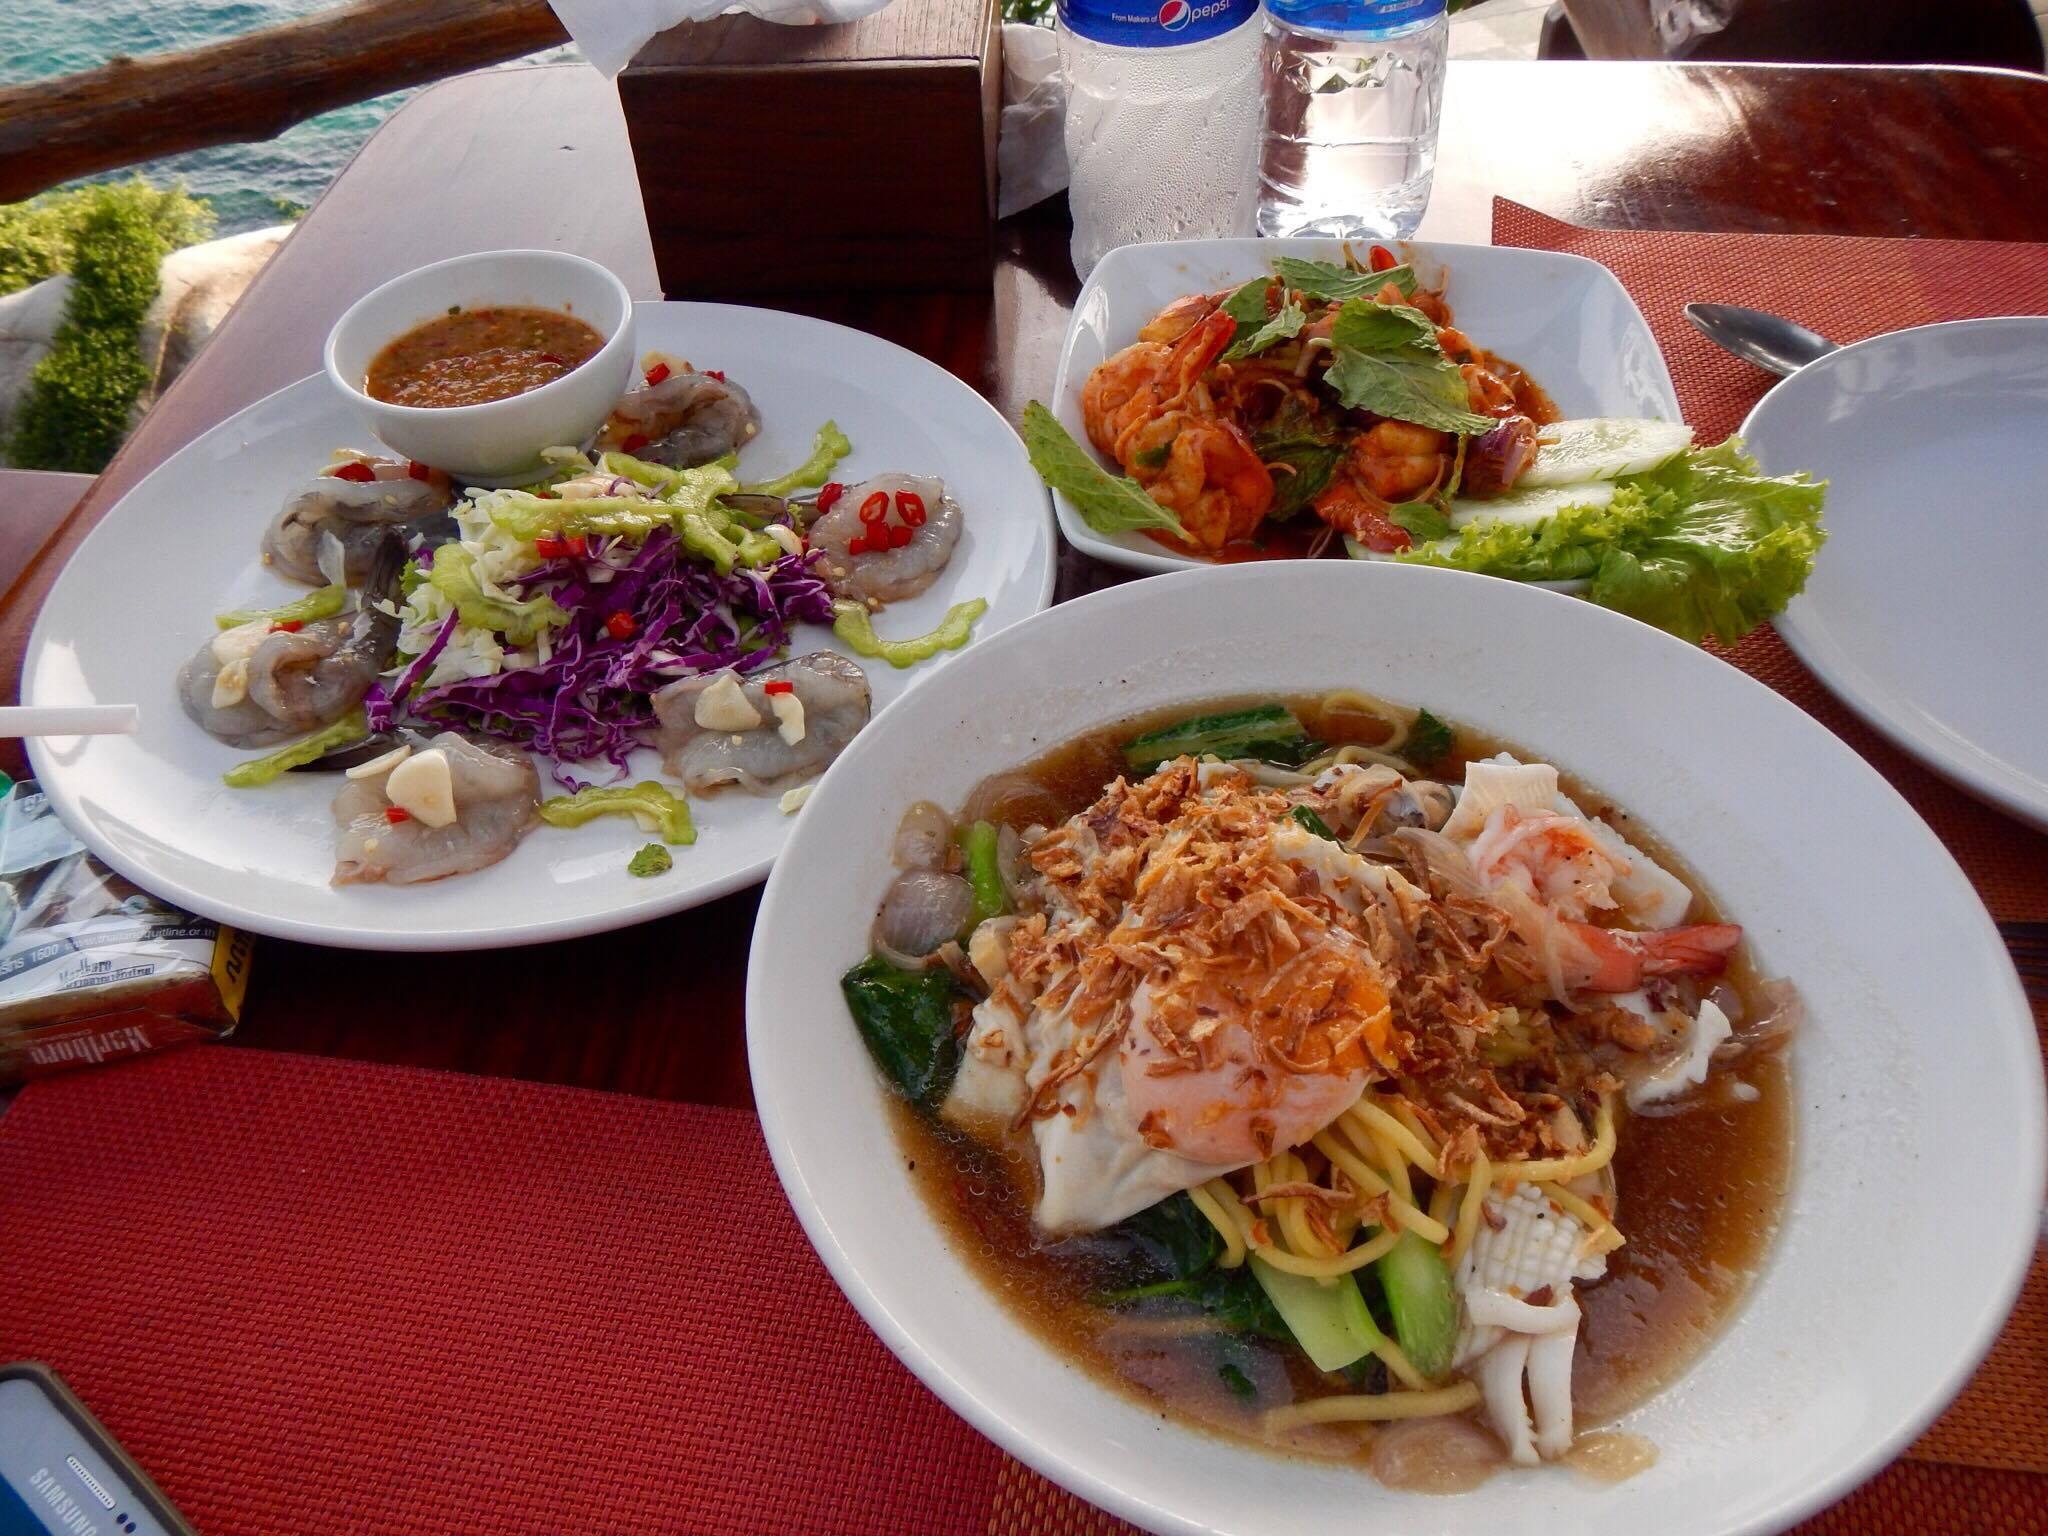 Seafood Phuket Prawns Thai Food Spicy Broth Soup Vegetables